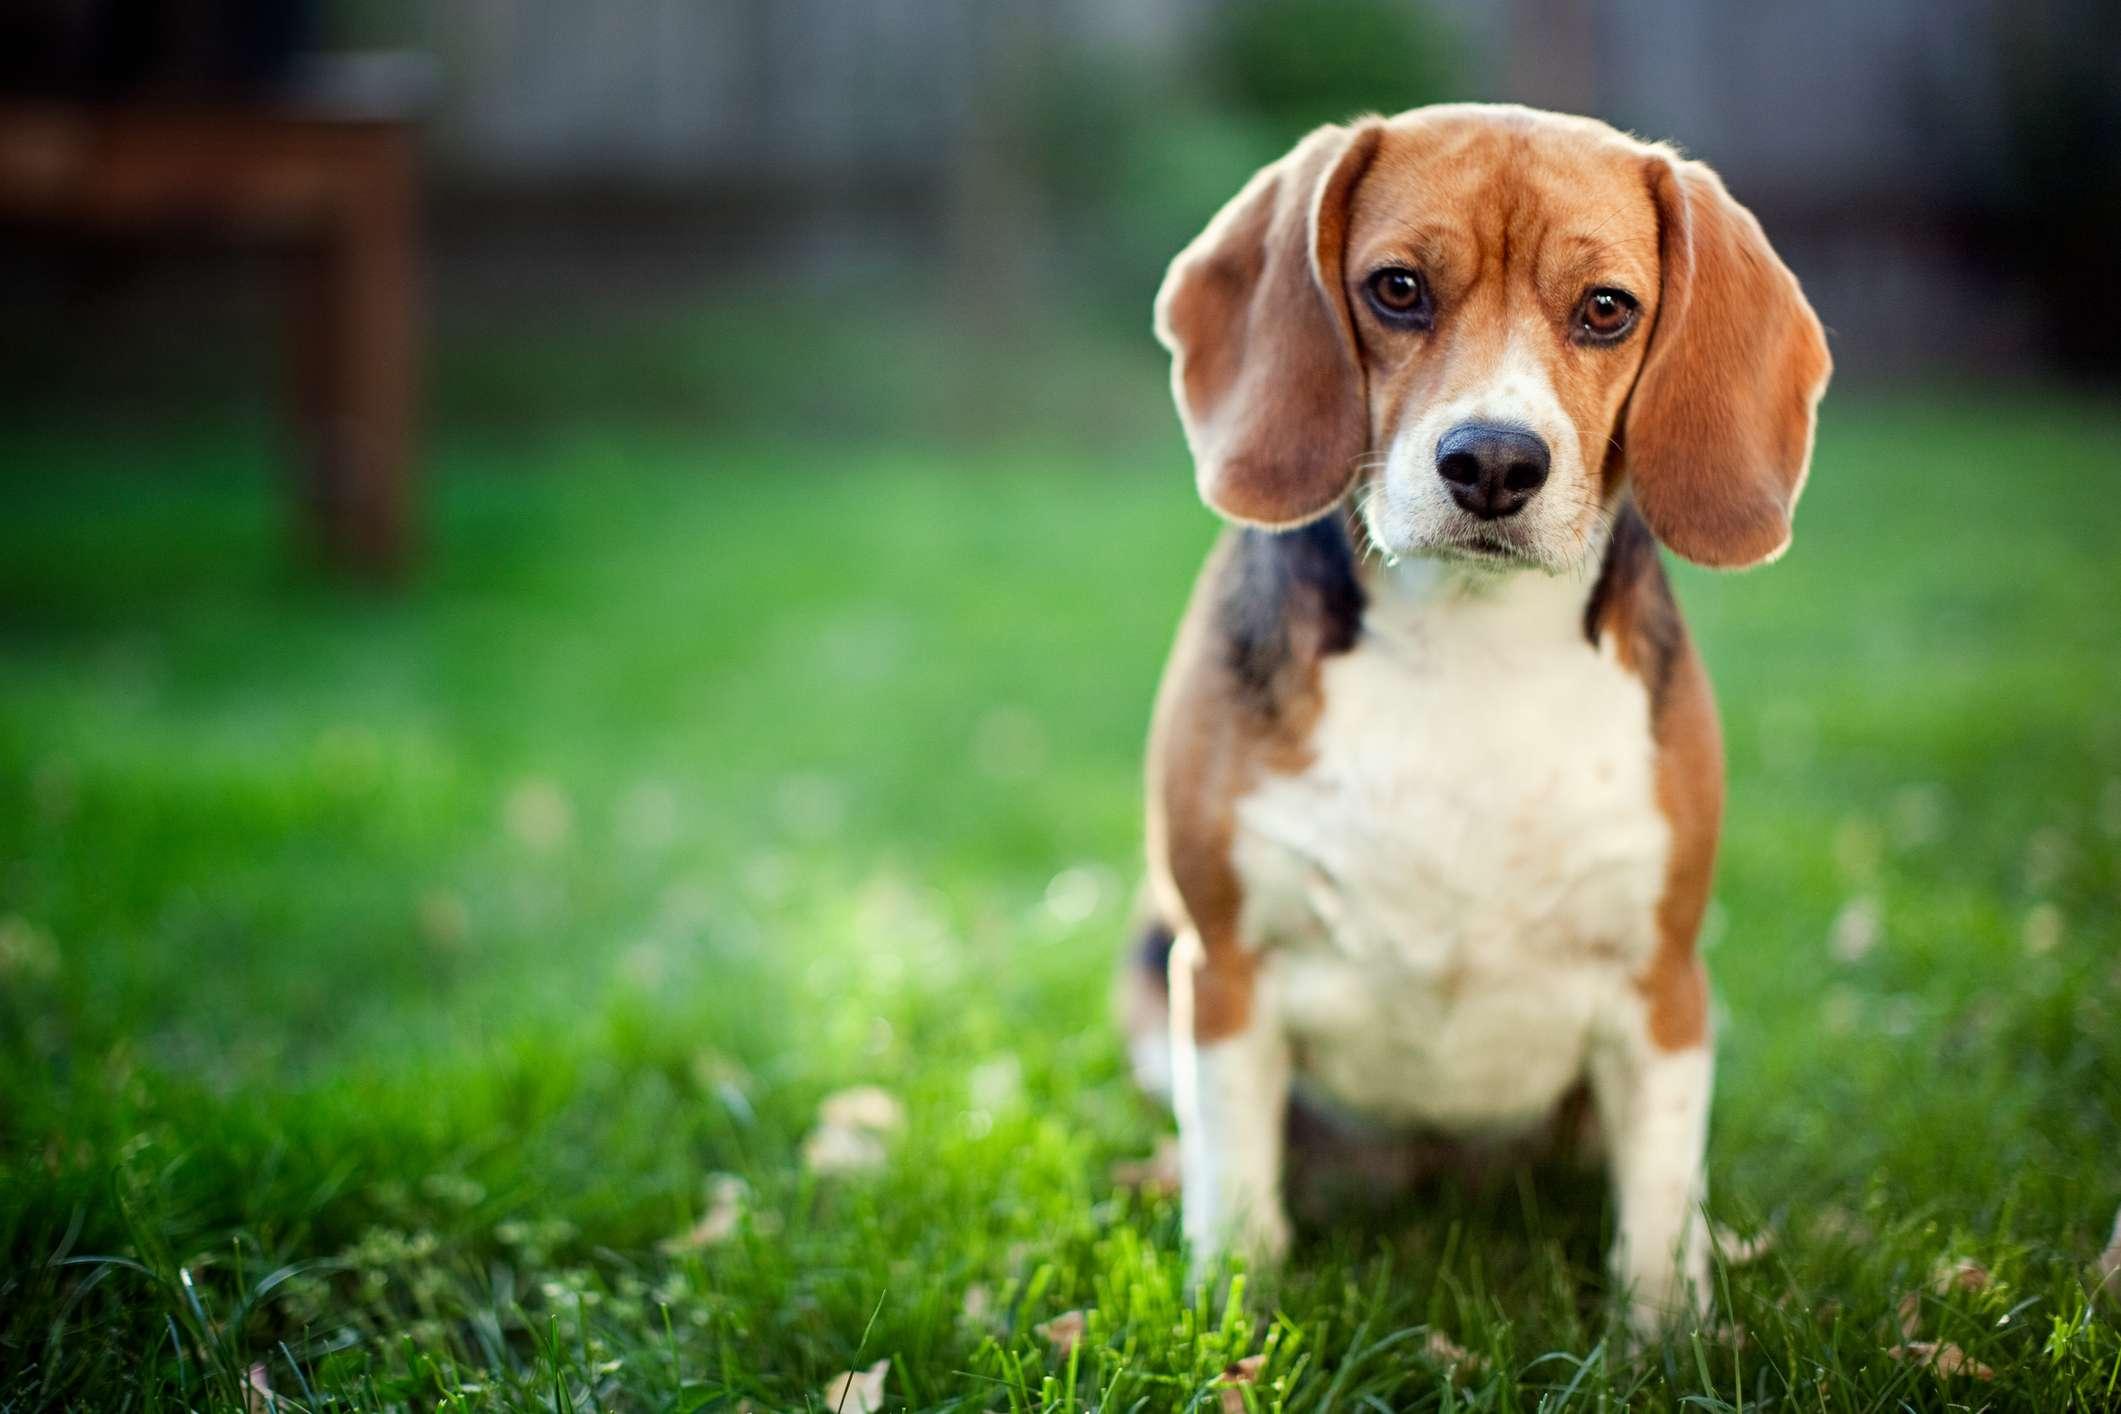 Beagle sitting the grass looking at camera.